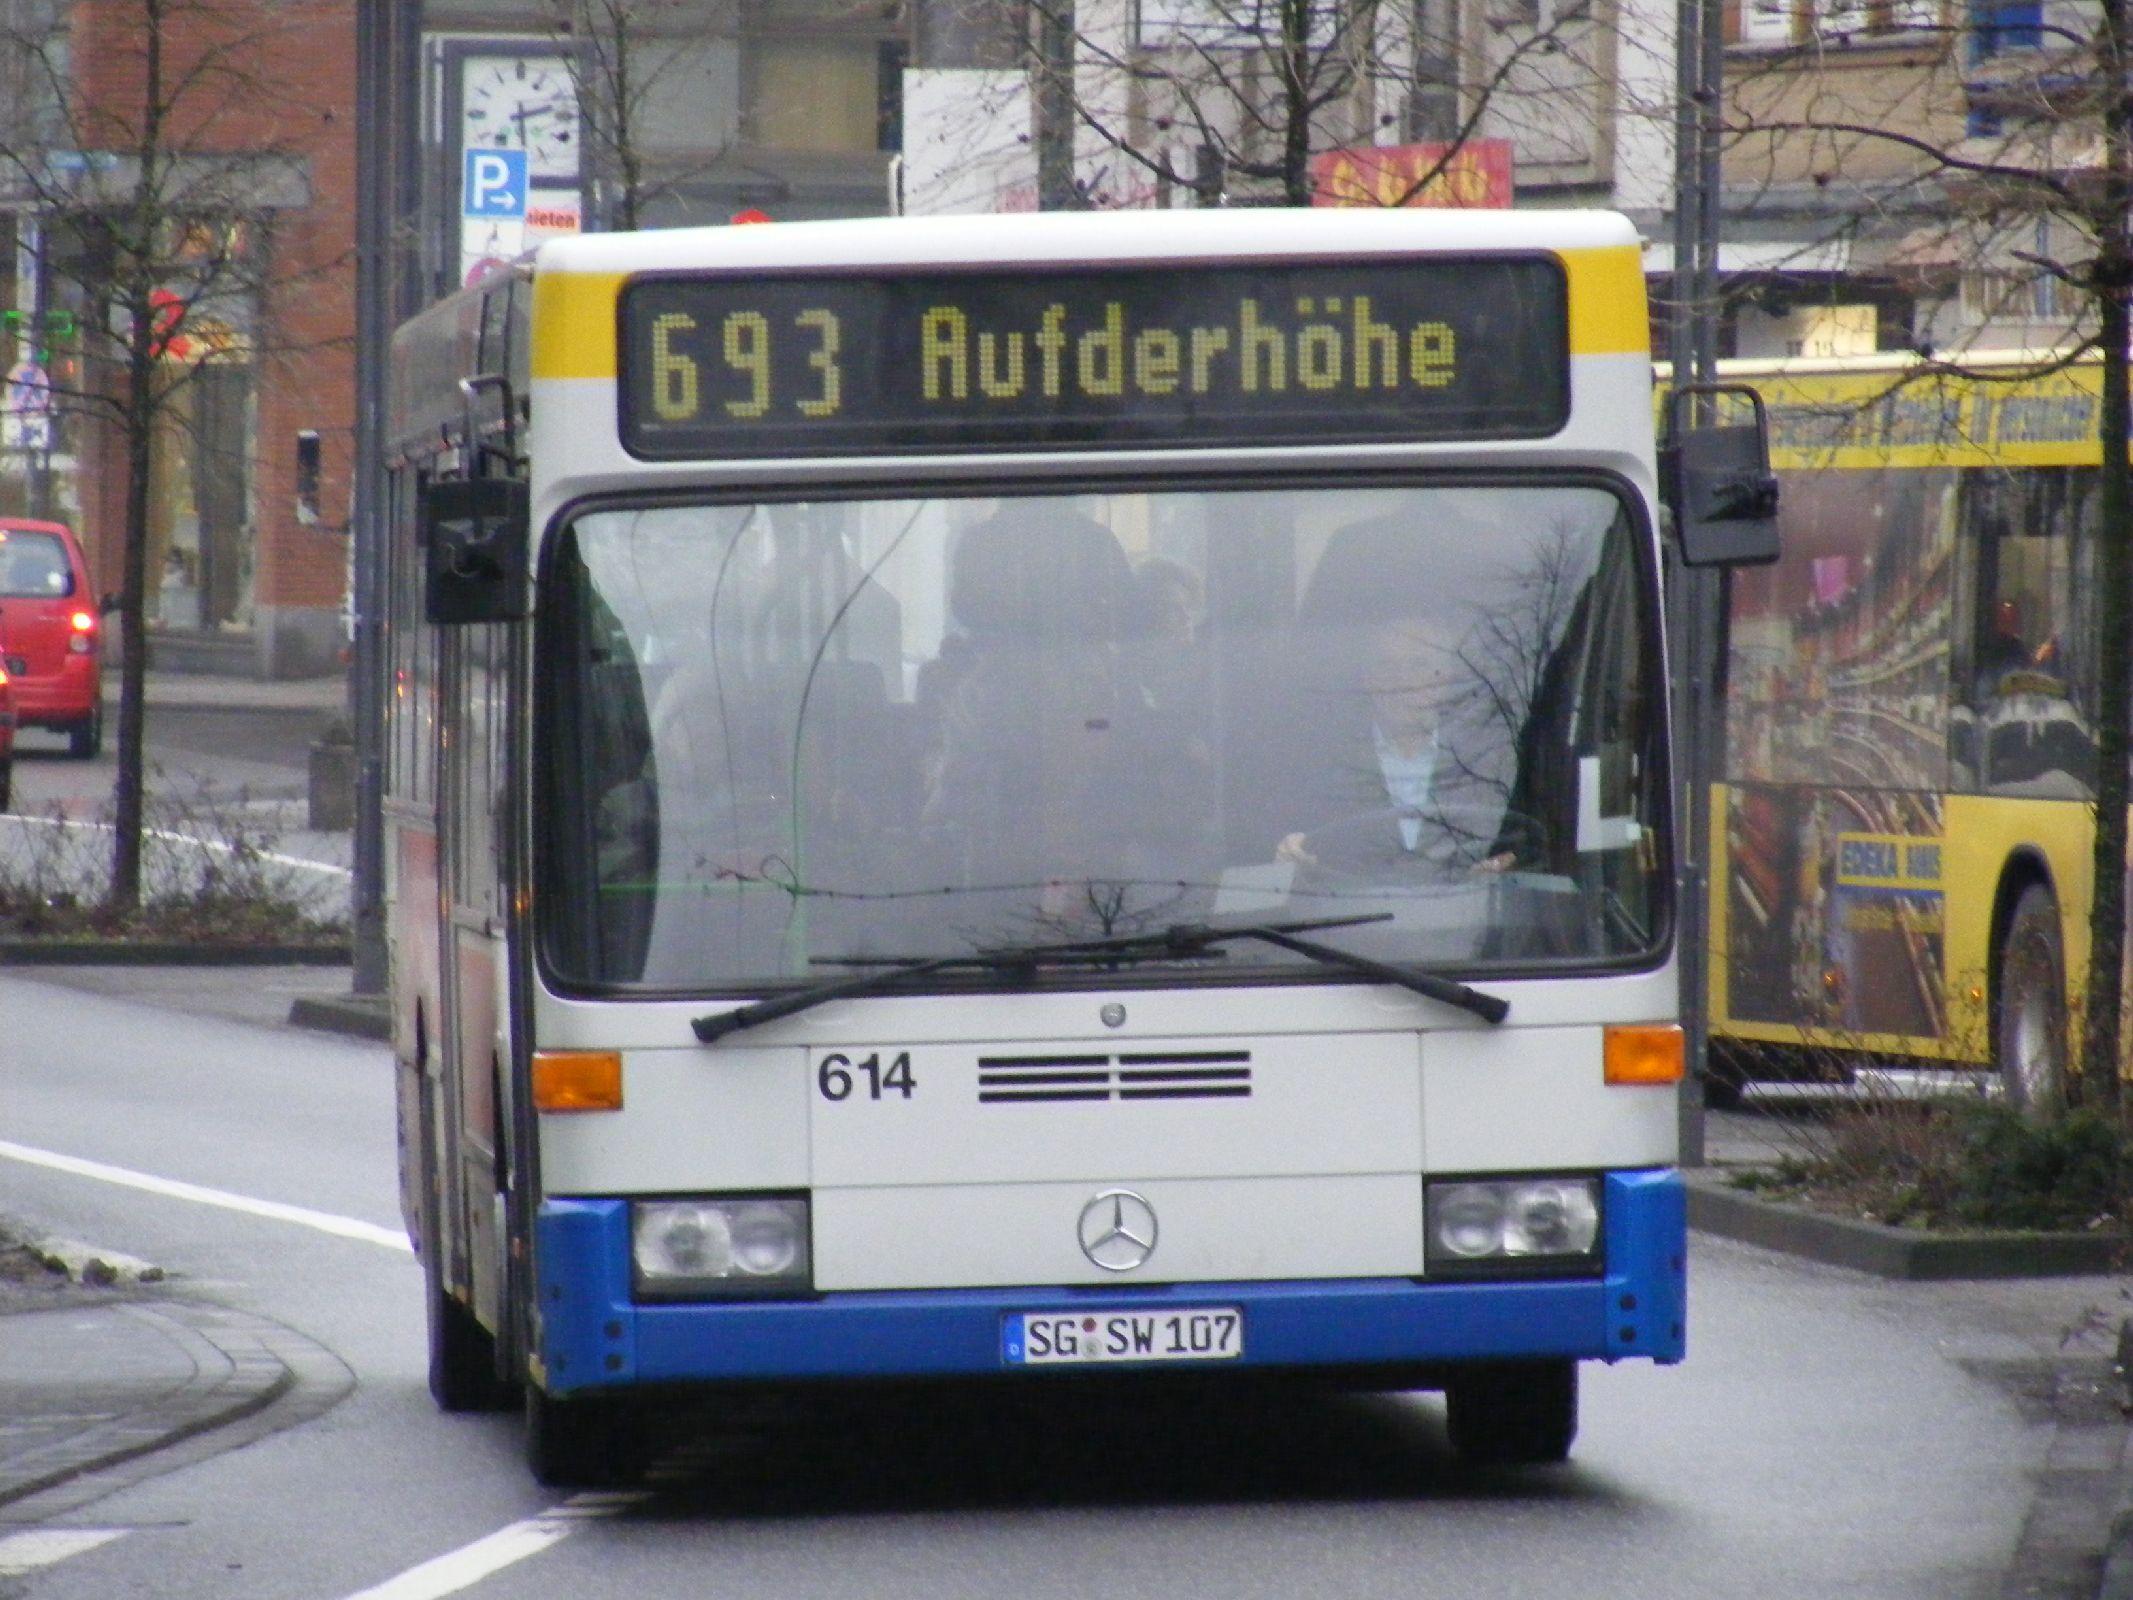 File:Solingen Mercedes bus nr 614, Linie 693. - Flickr - sludgegulper.